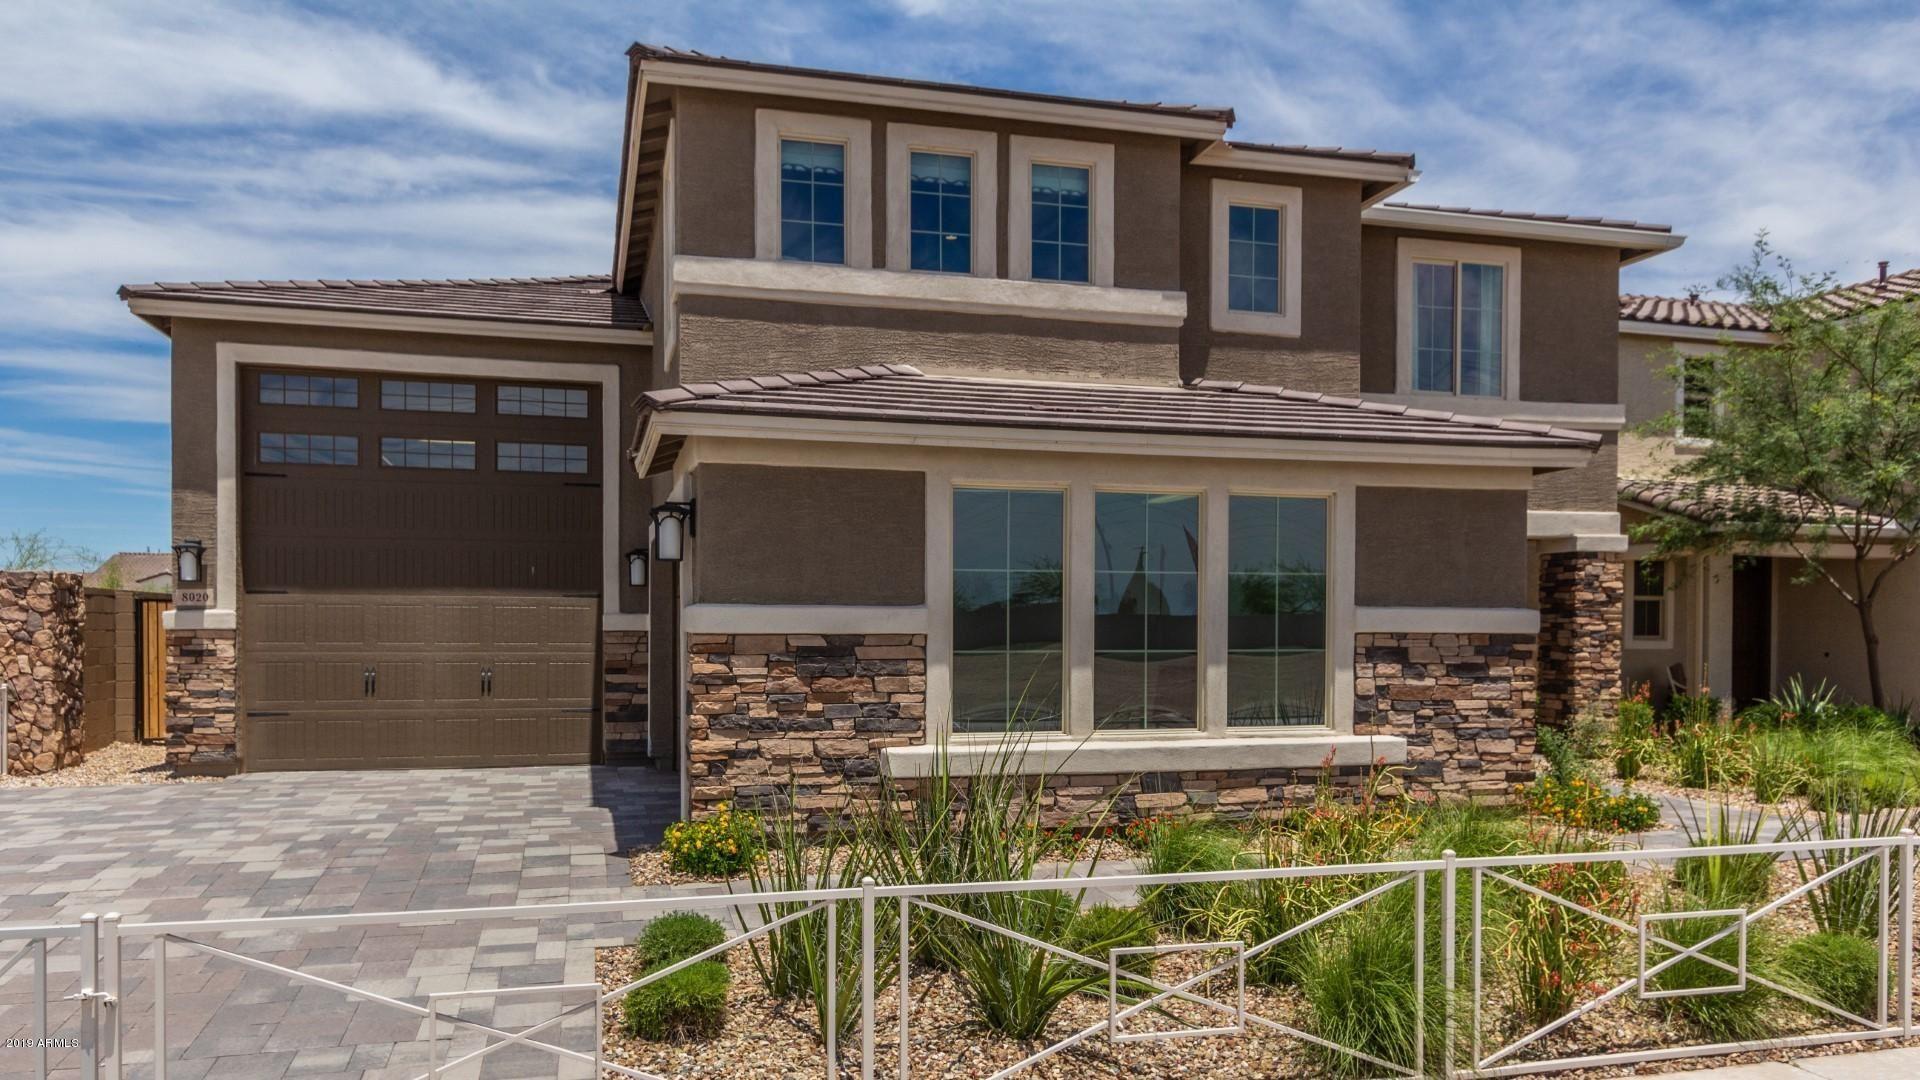 Property Image Of 8020 W Pueblo Avenue In Phoenix, Az